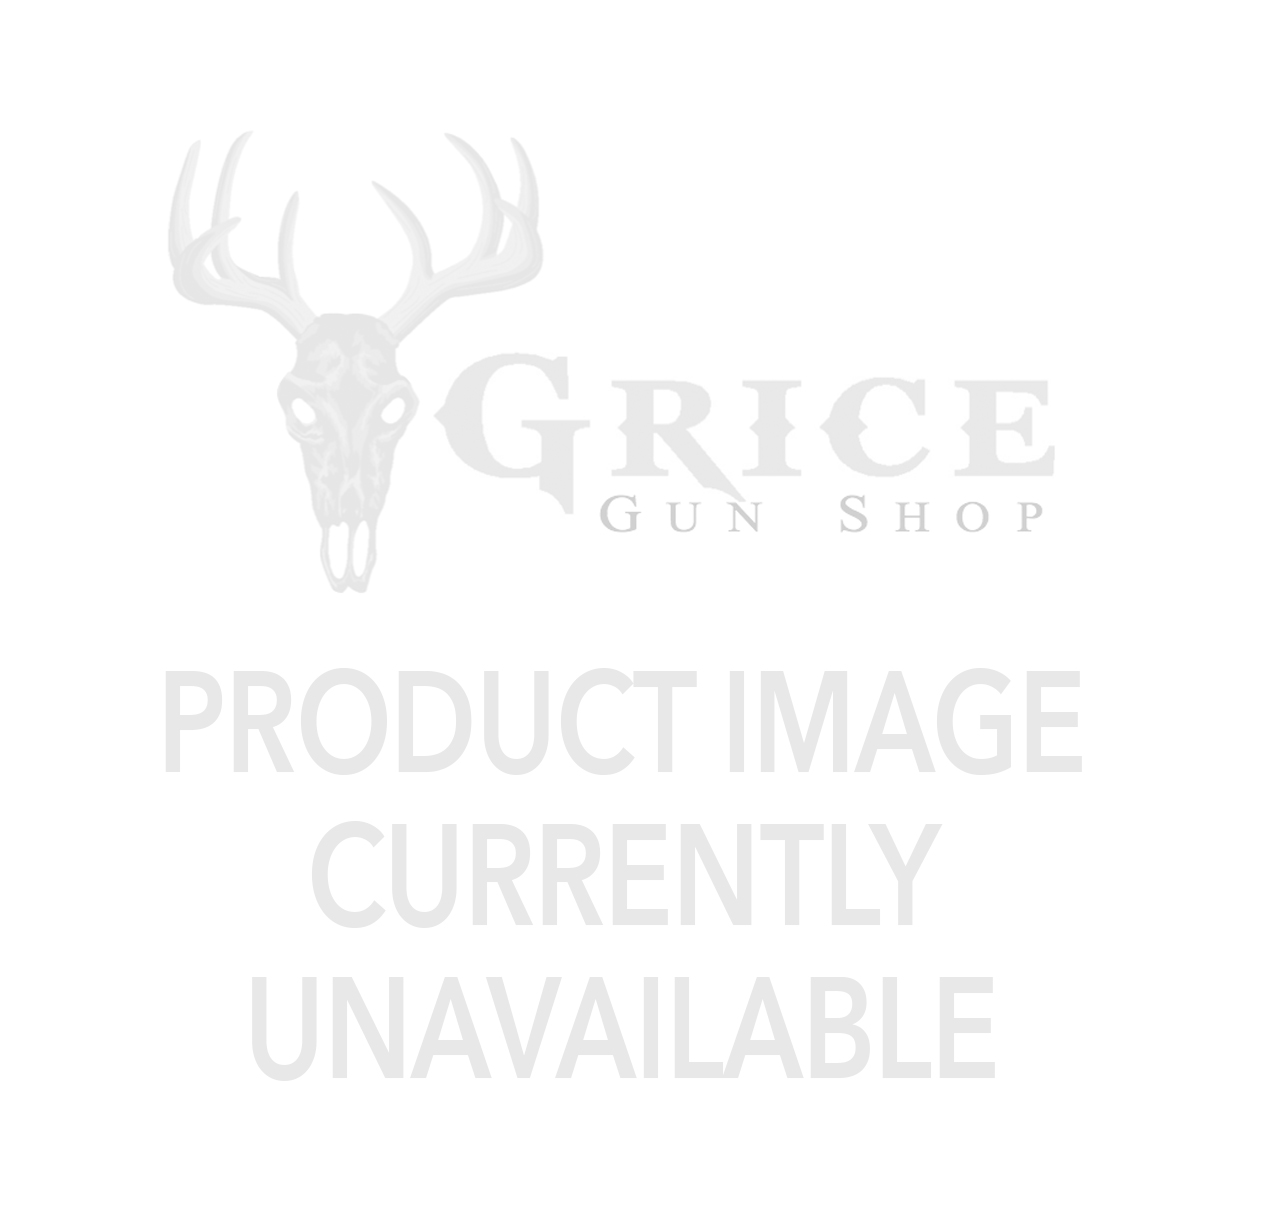 Birchwood Casey - Silhouette Target